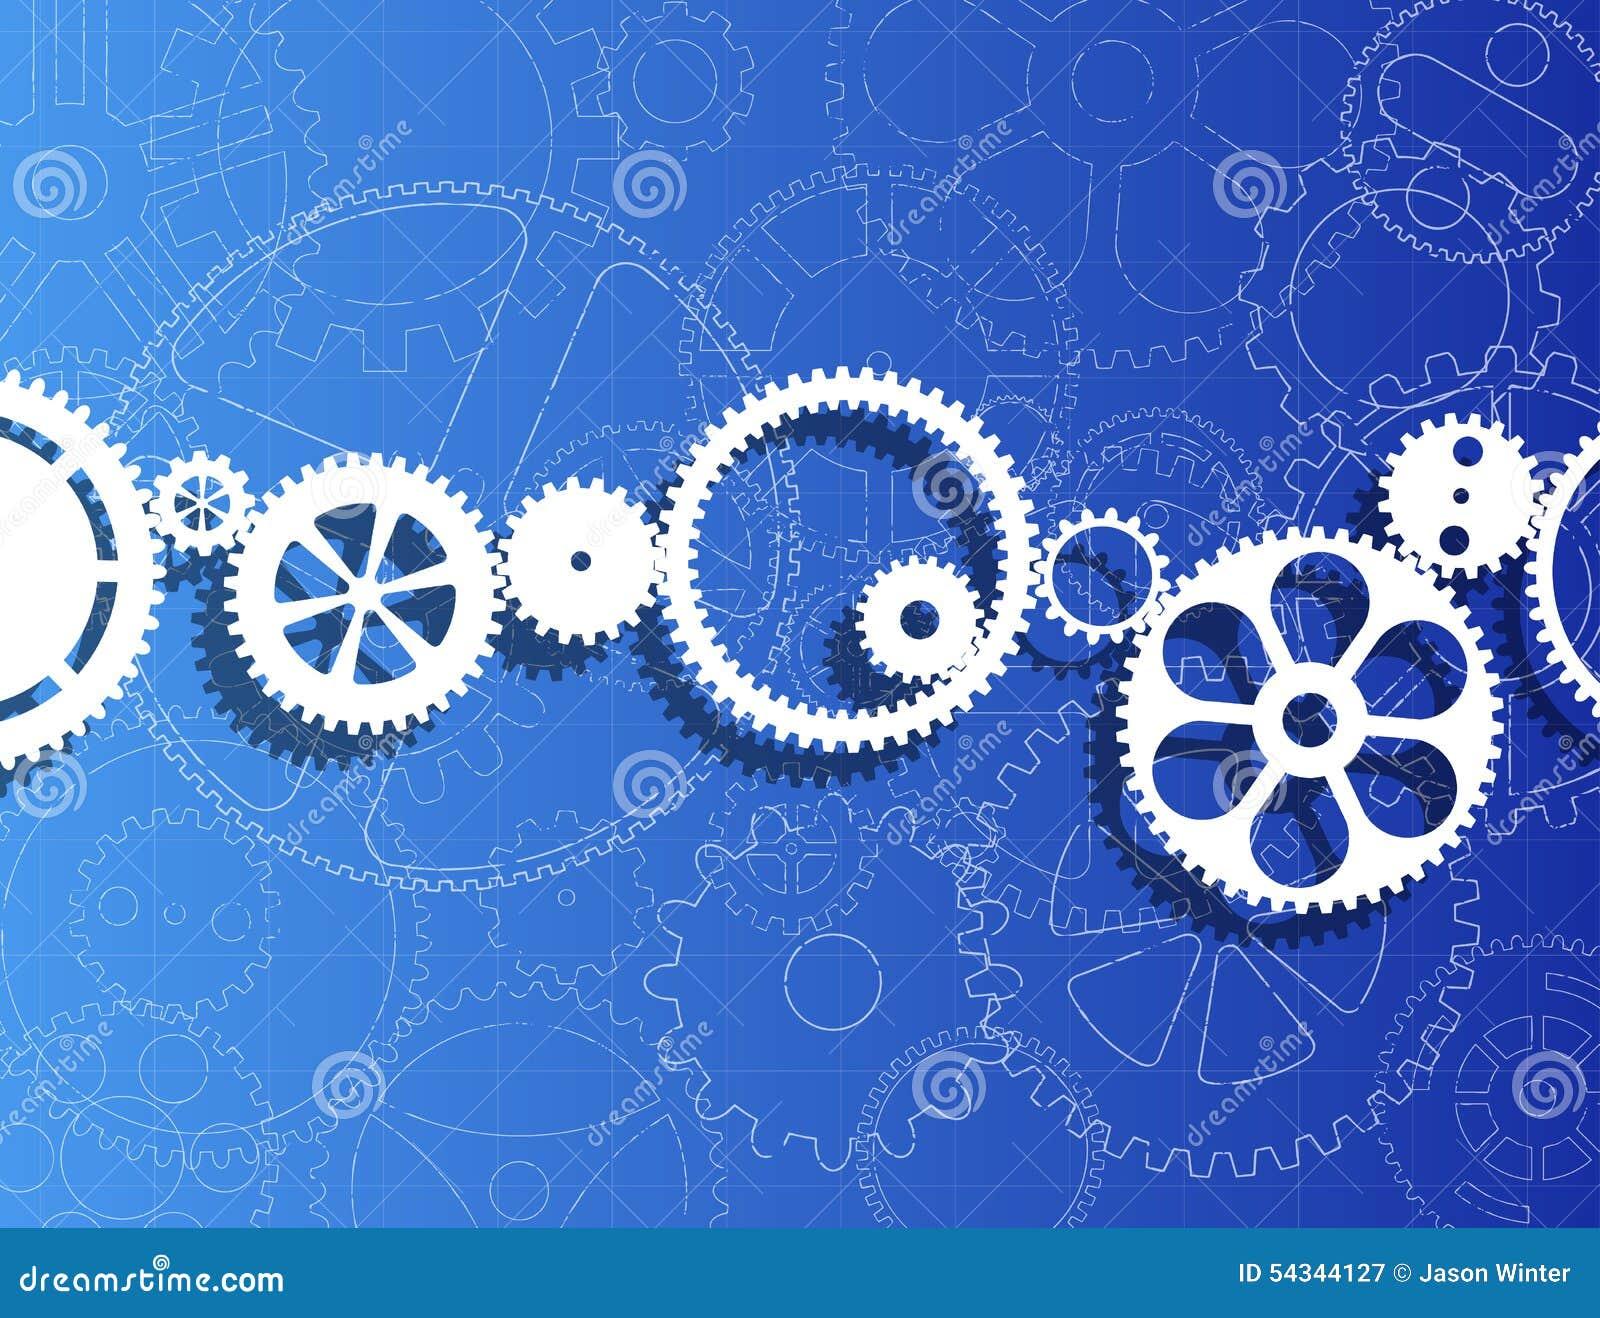 Gears and blueprint stock vector illustration of blueprint 54344127 gears and blueprint royalty free vector malvernweather Choice Image